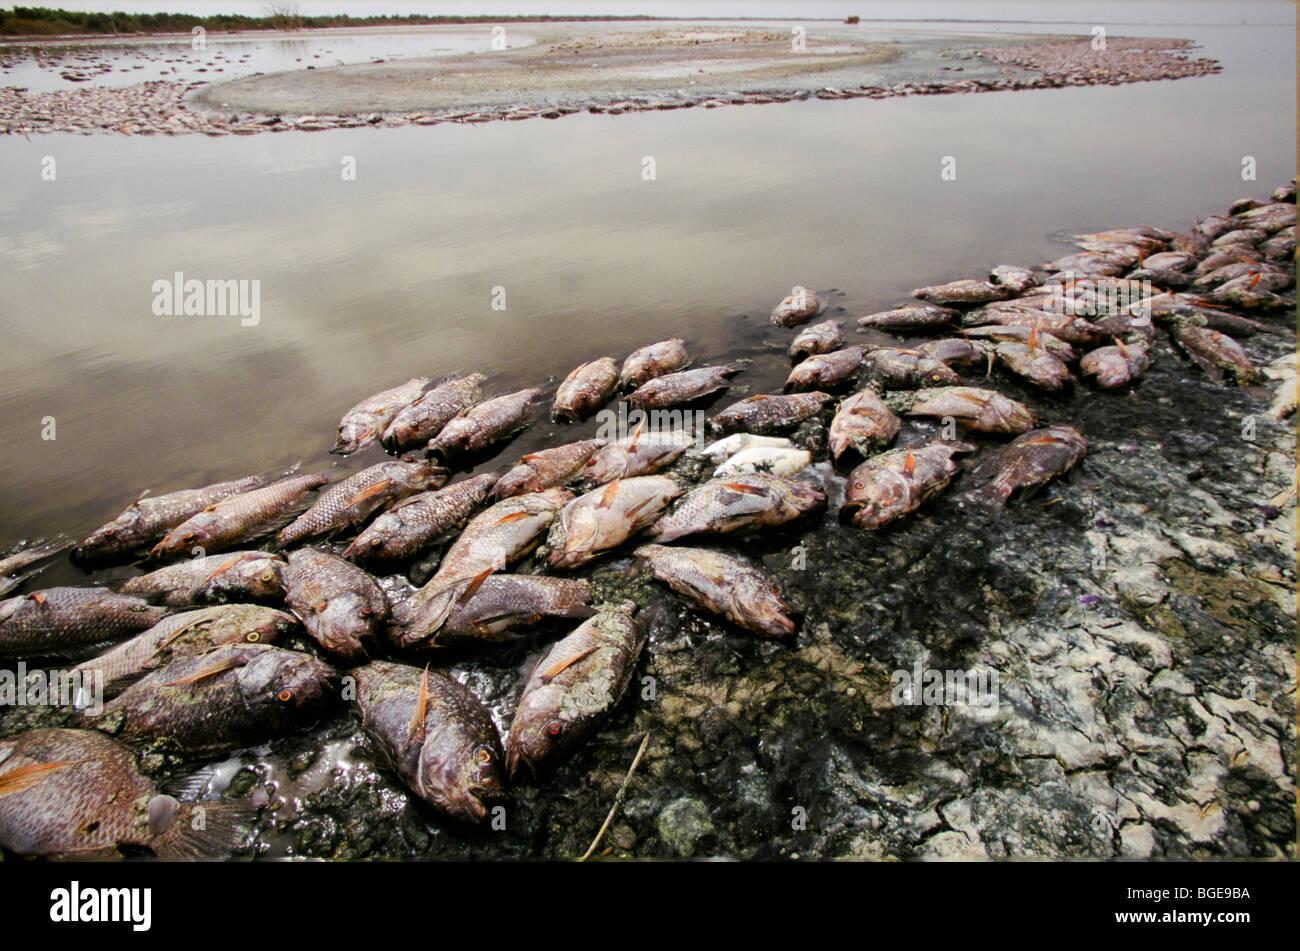 Dead fish in the salton sea killed by low oxygen levels for Salton sea fishing